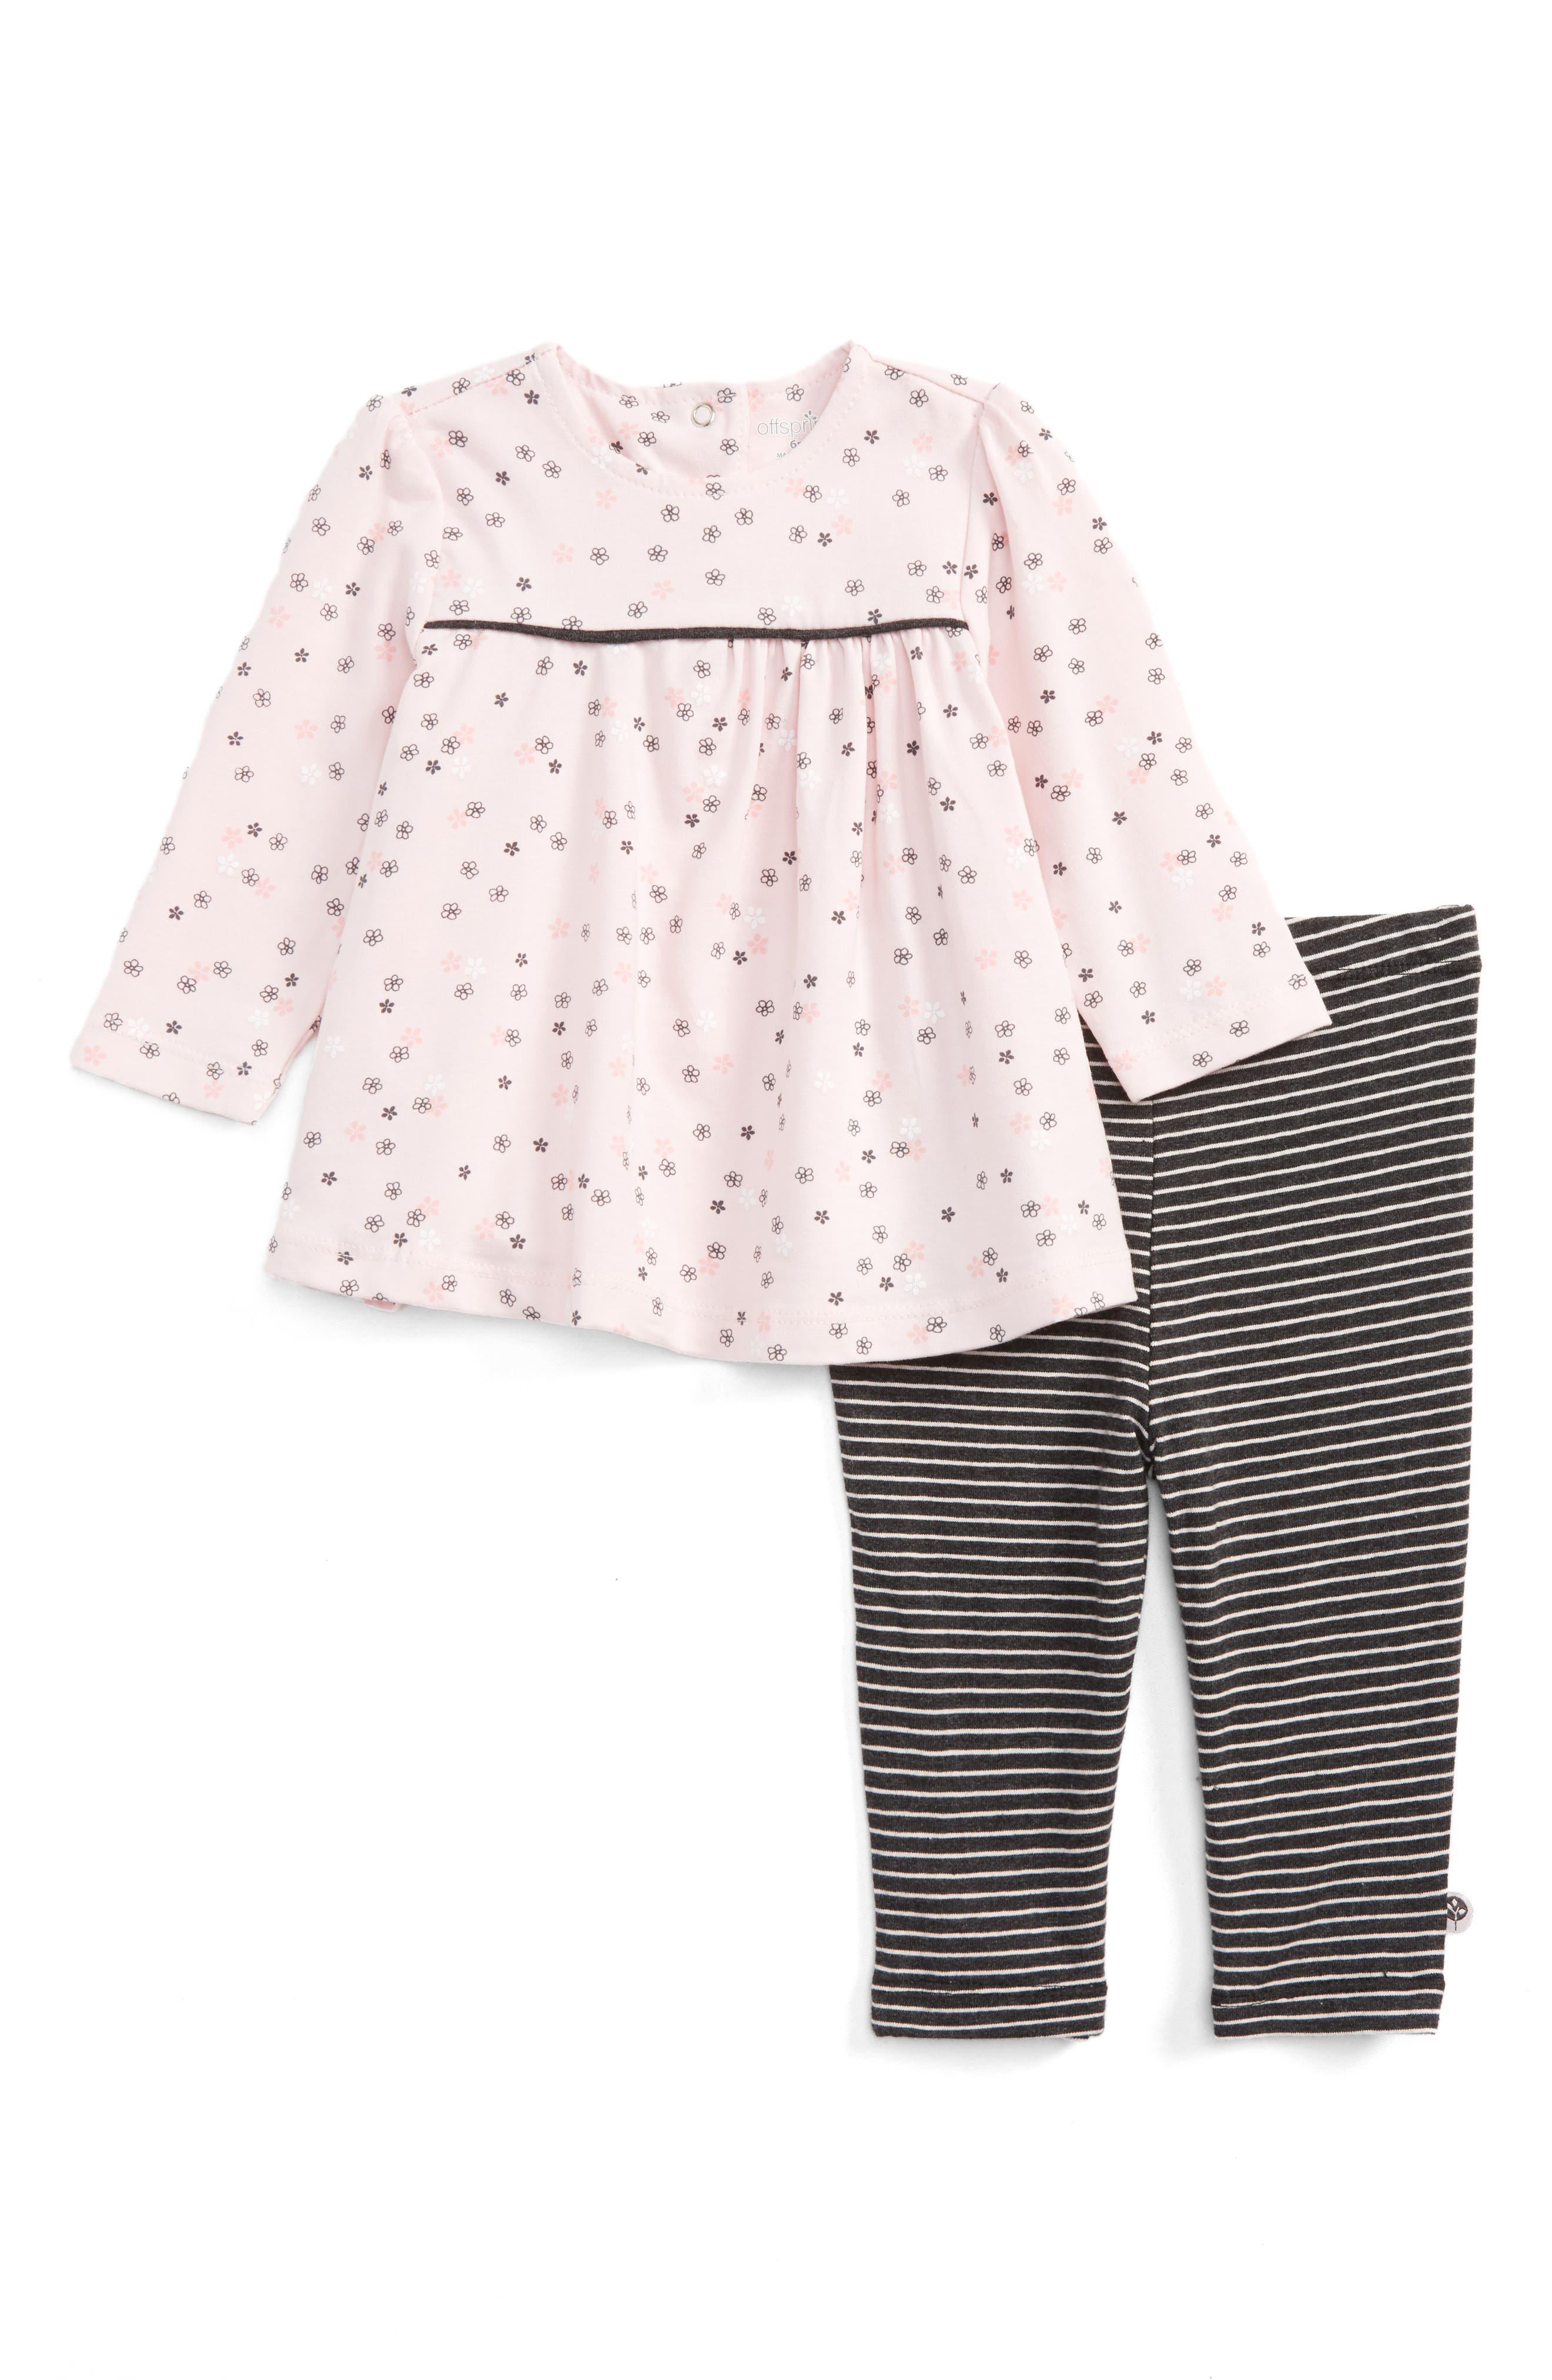 Alternate Image 1 Selected - Offspring Delicate Blush Tunic & Leggings Set (Baby Girls)